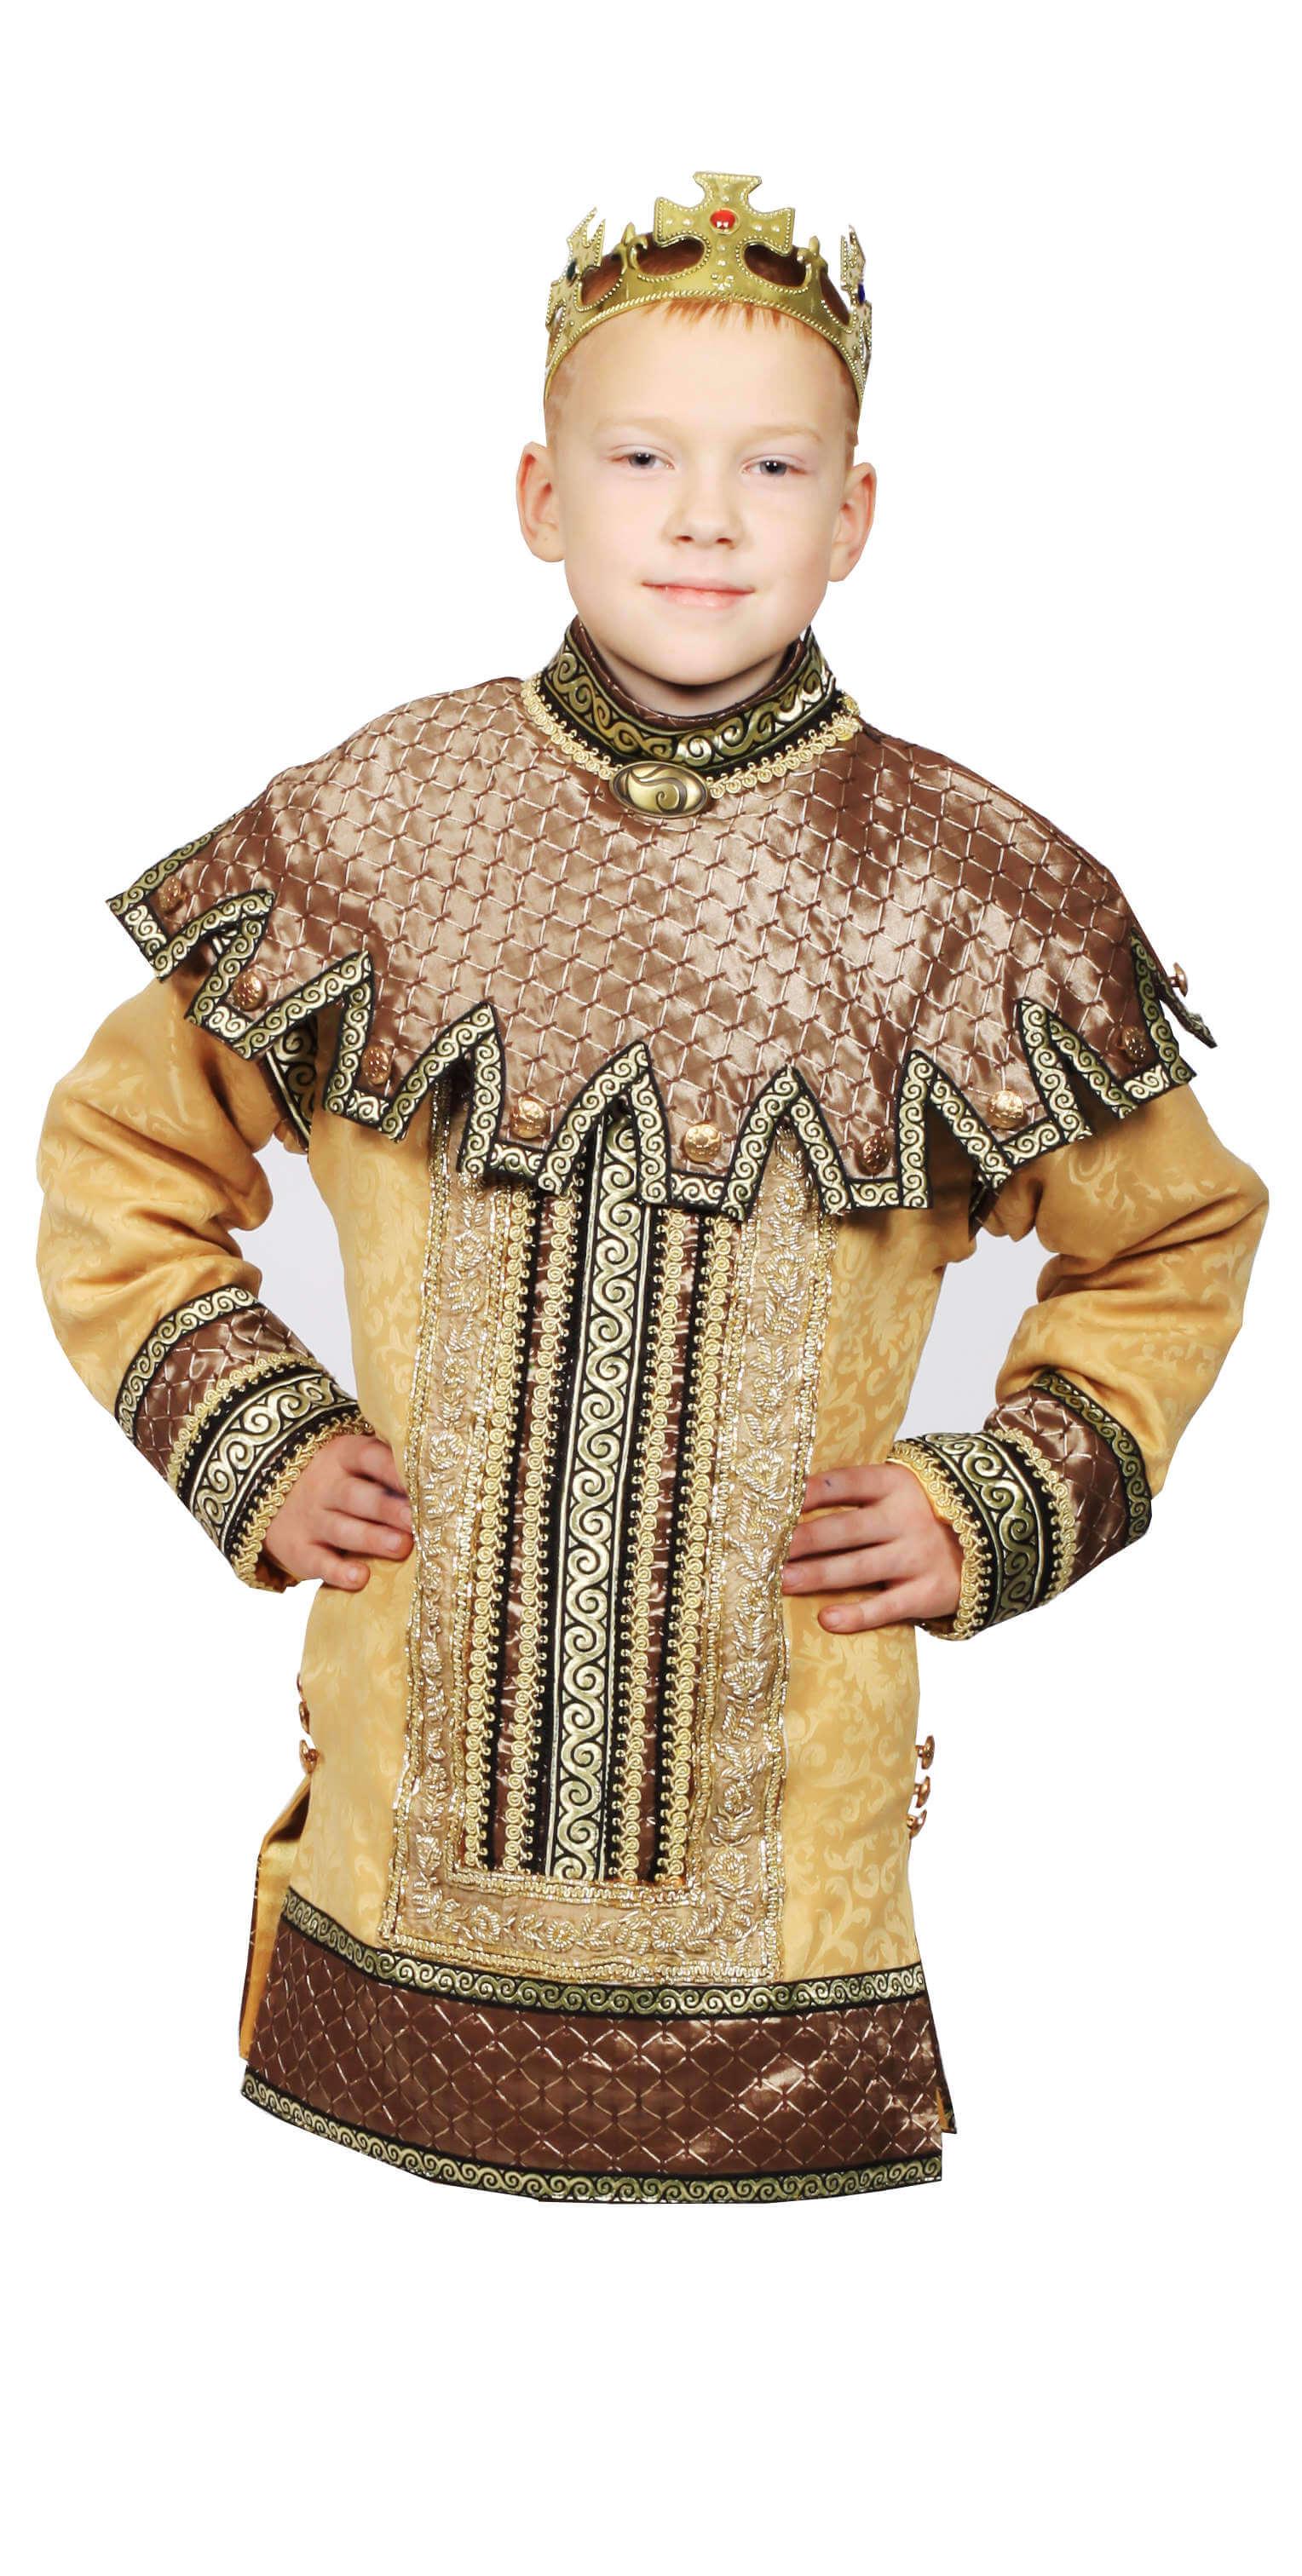 Karaliaus, didiko kostiumas. Kaina 25 Eur